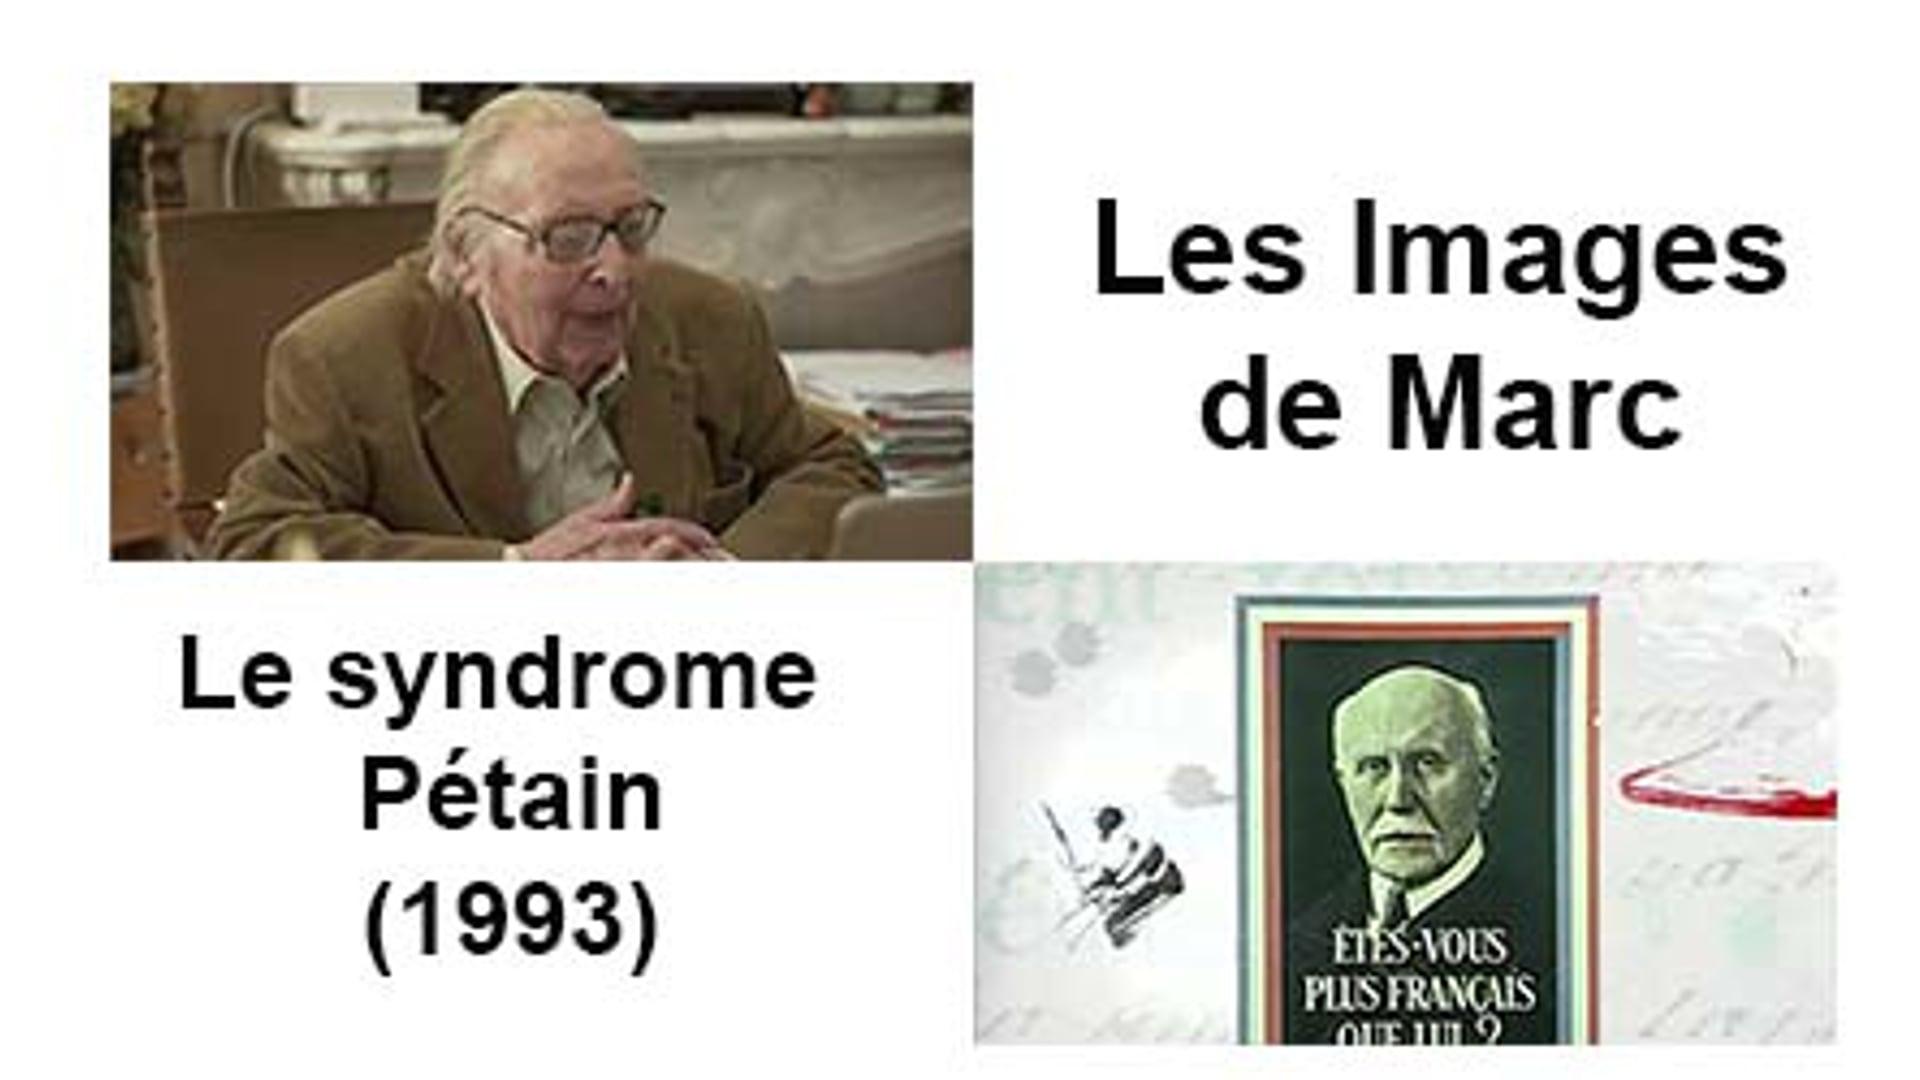 Le syndrome Pétain (1993)